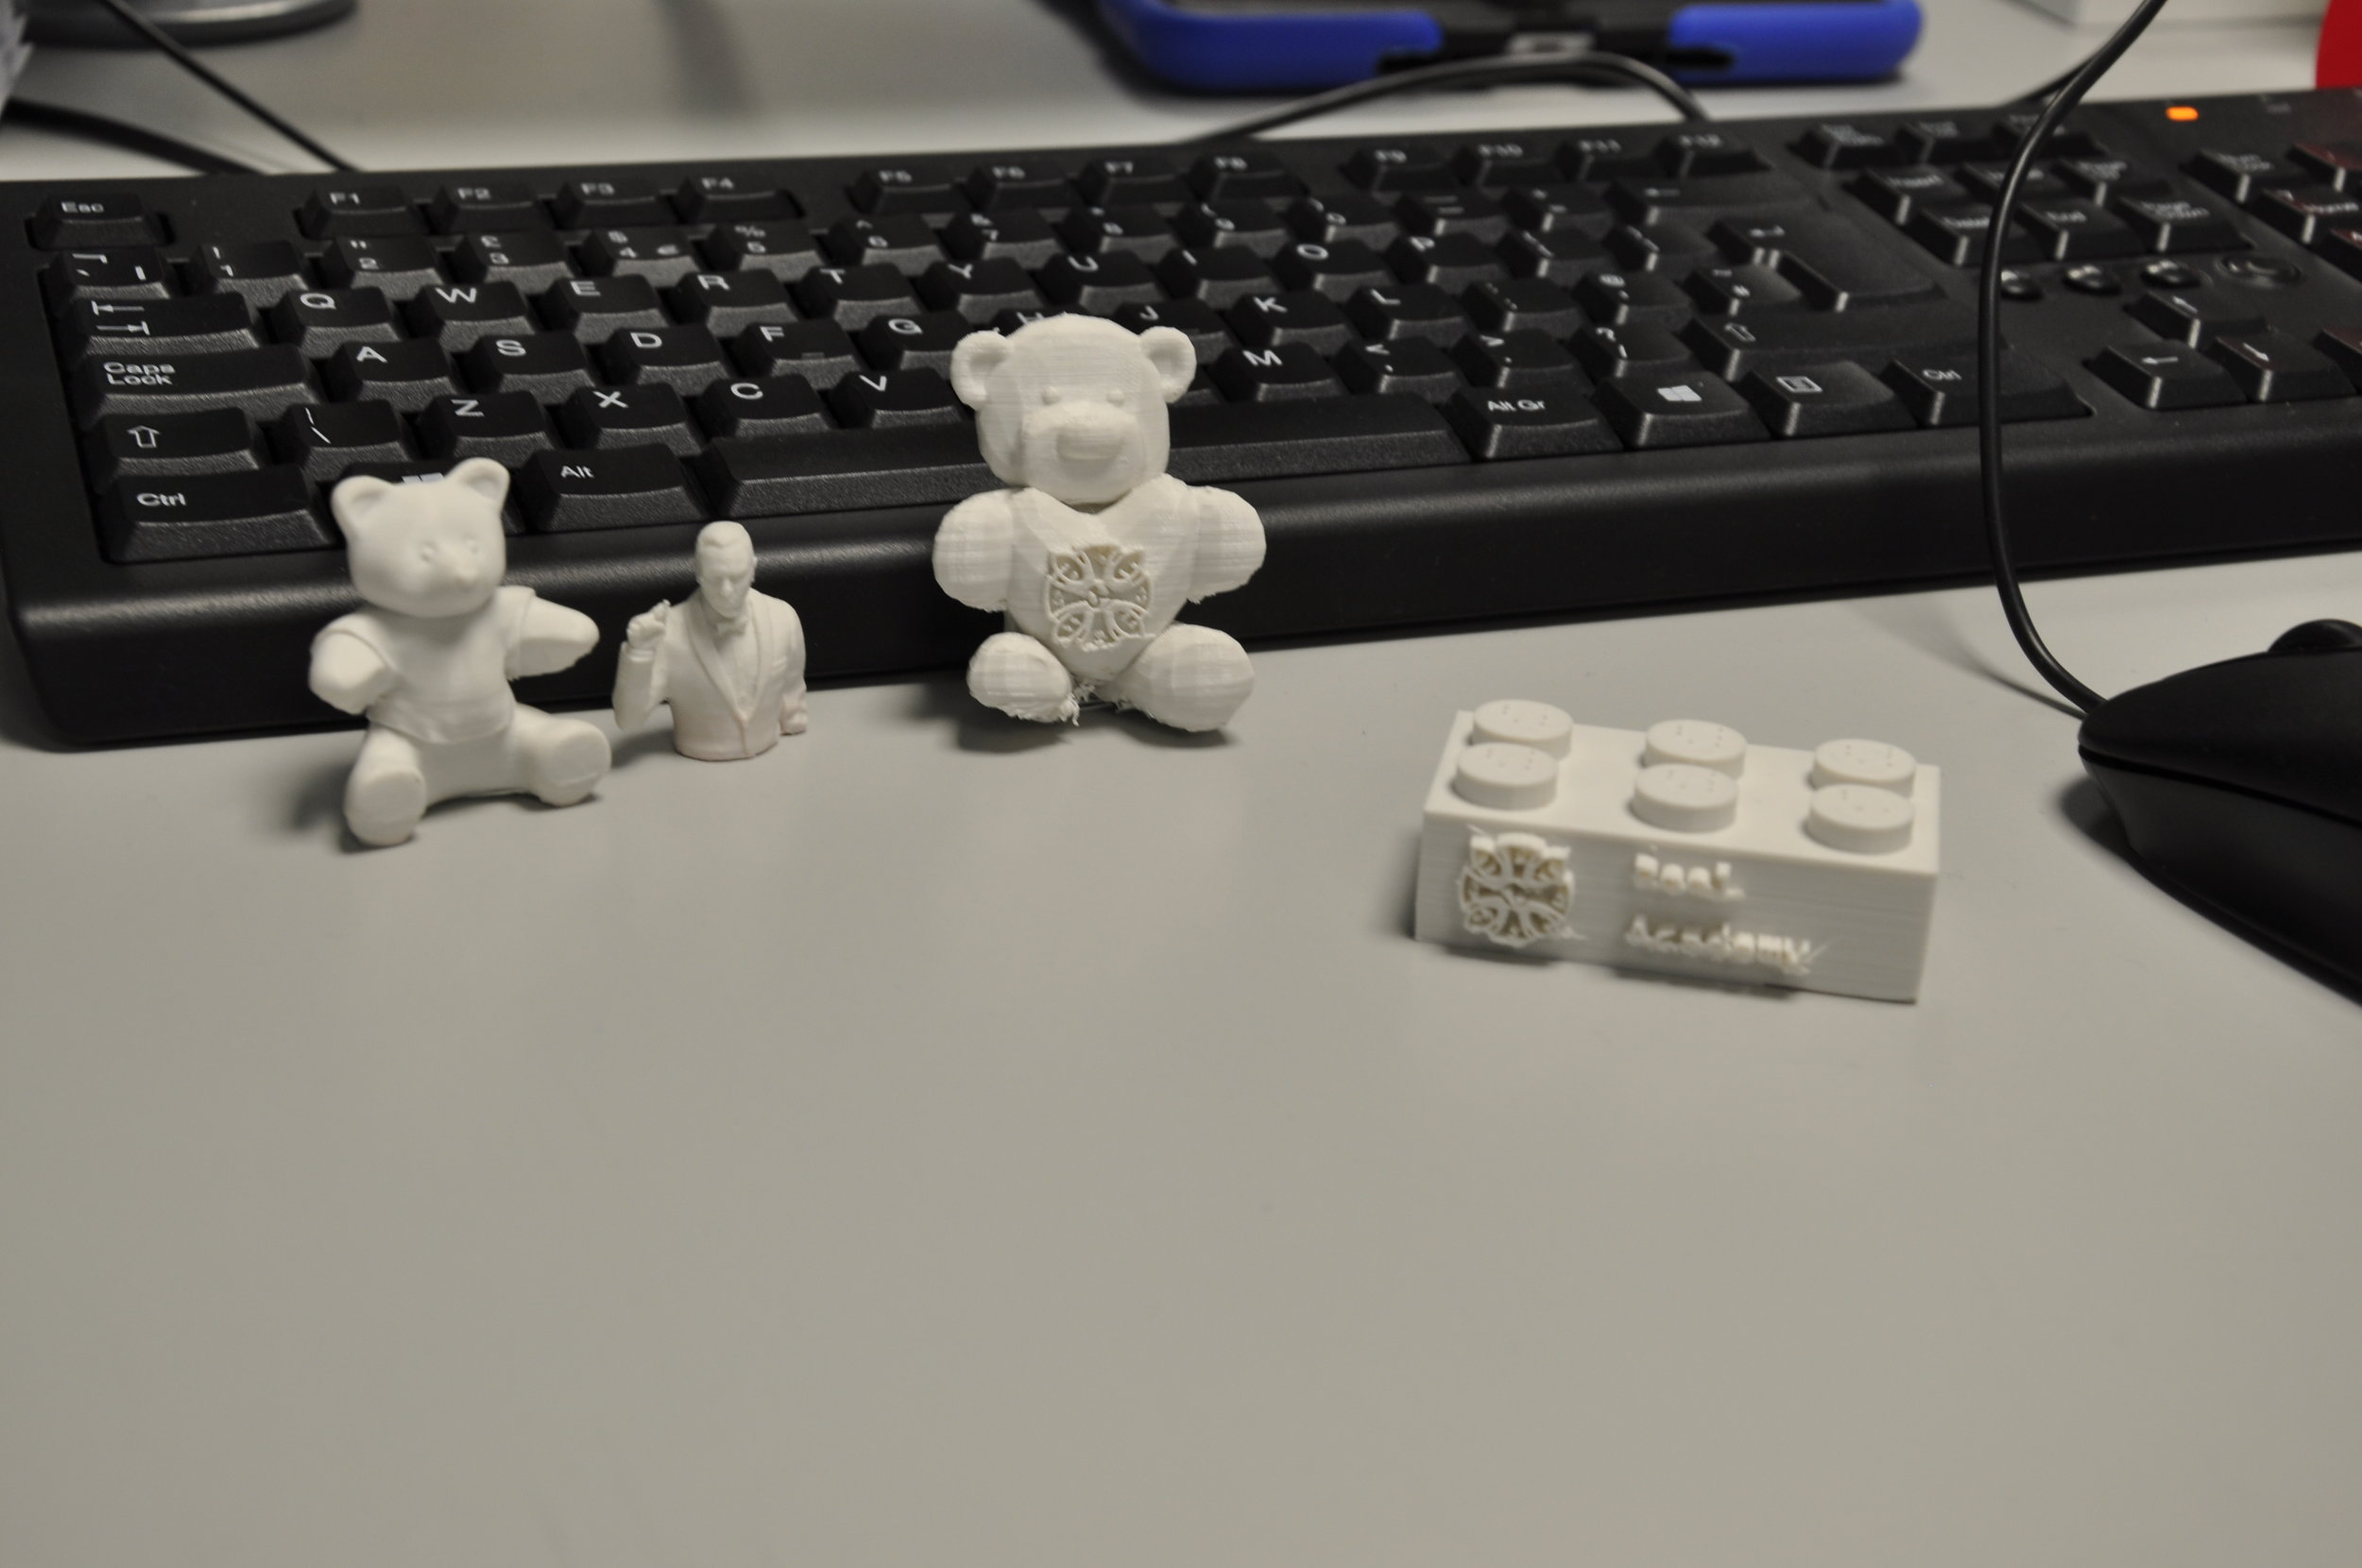 3Dprint1.JPG